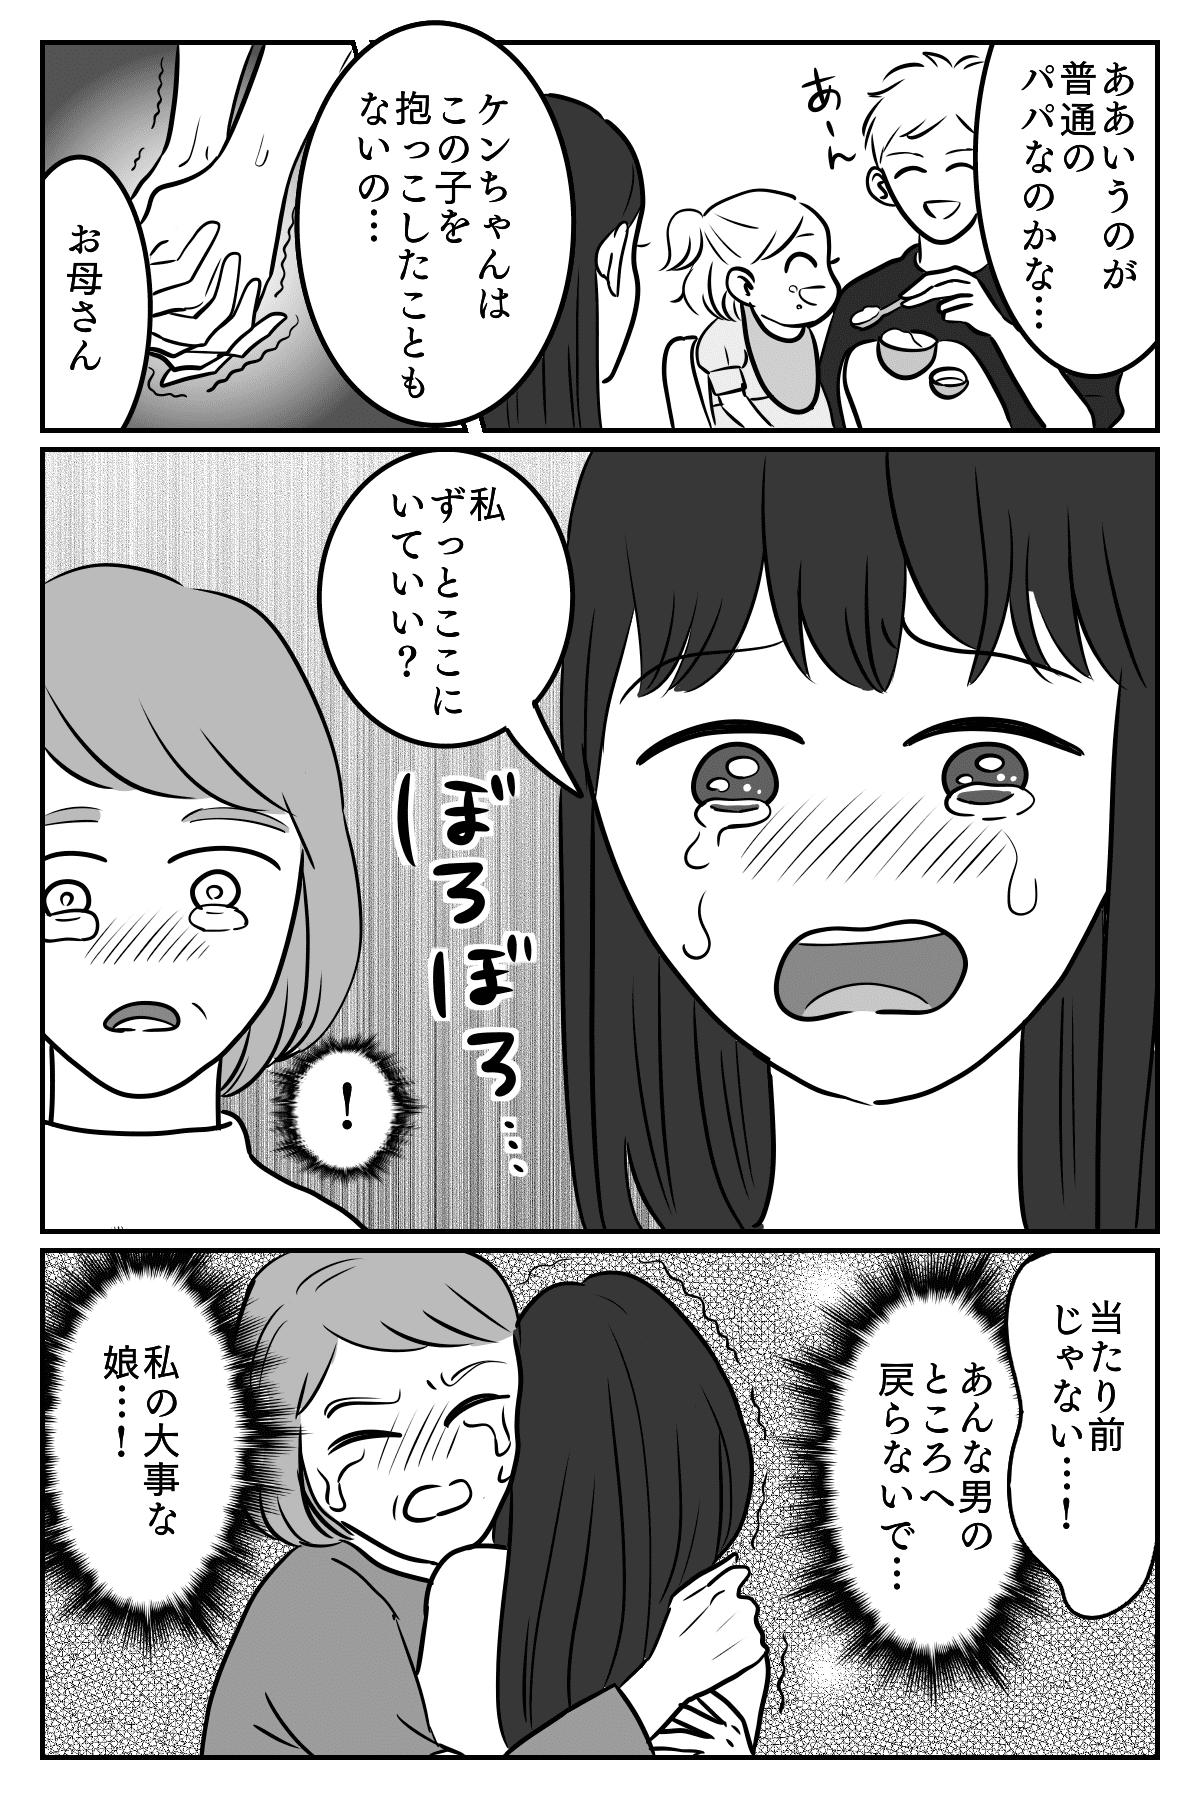 娘夫4-3